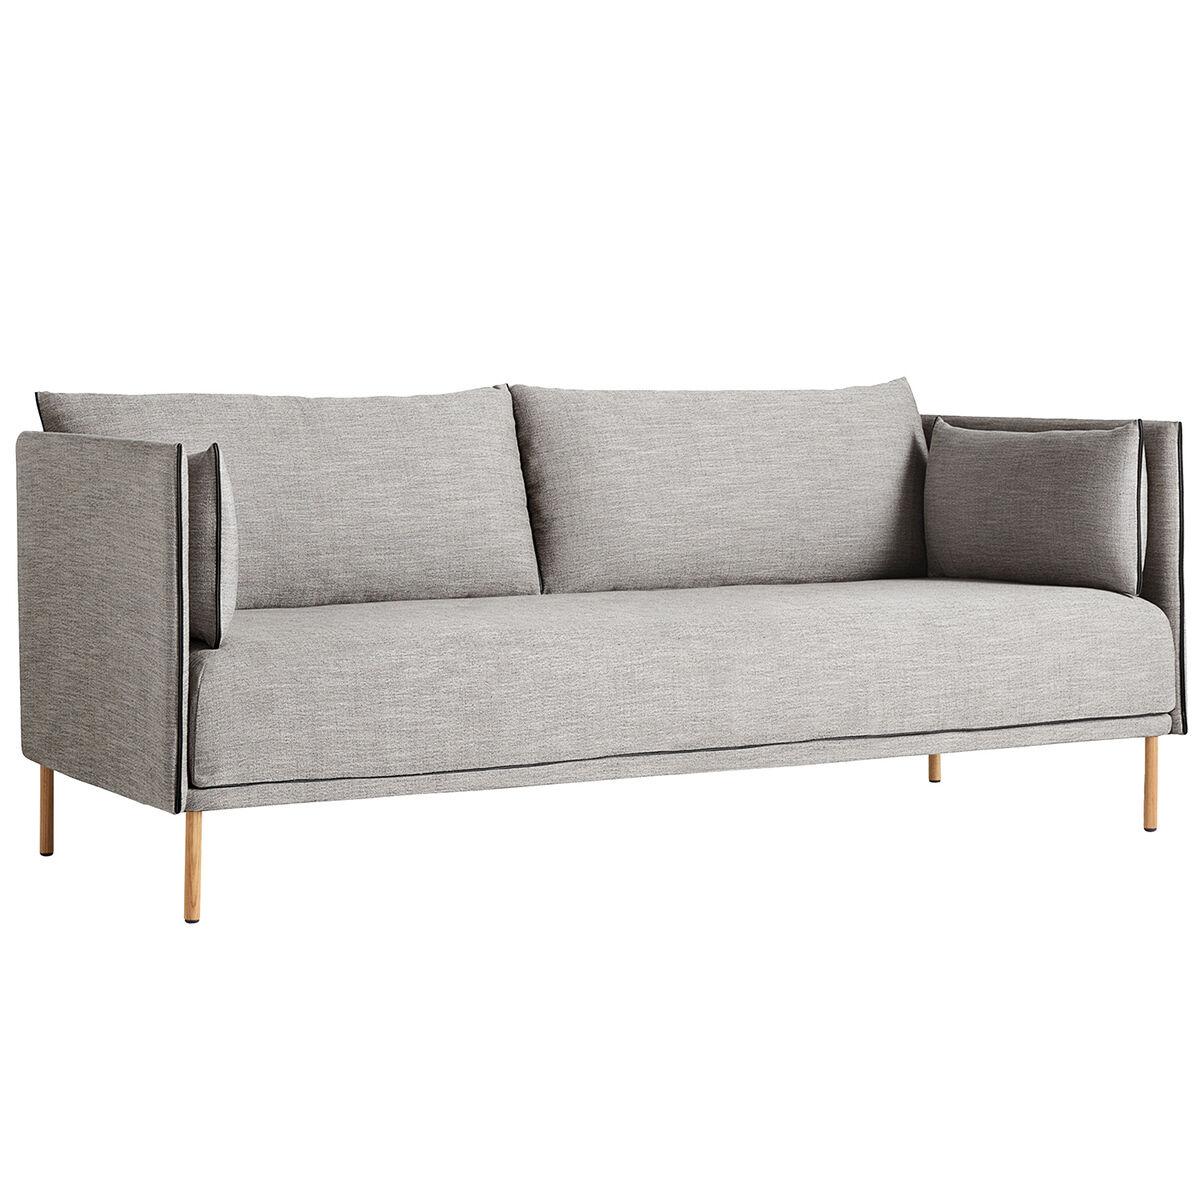 Hay Silhouette sohva 2-ist, Ruskin 33/Silk black - öljytty tammi